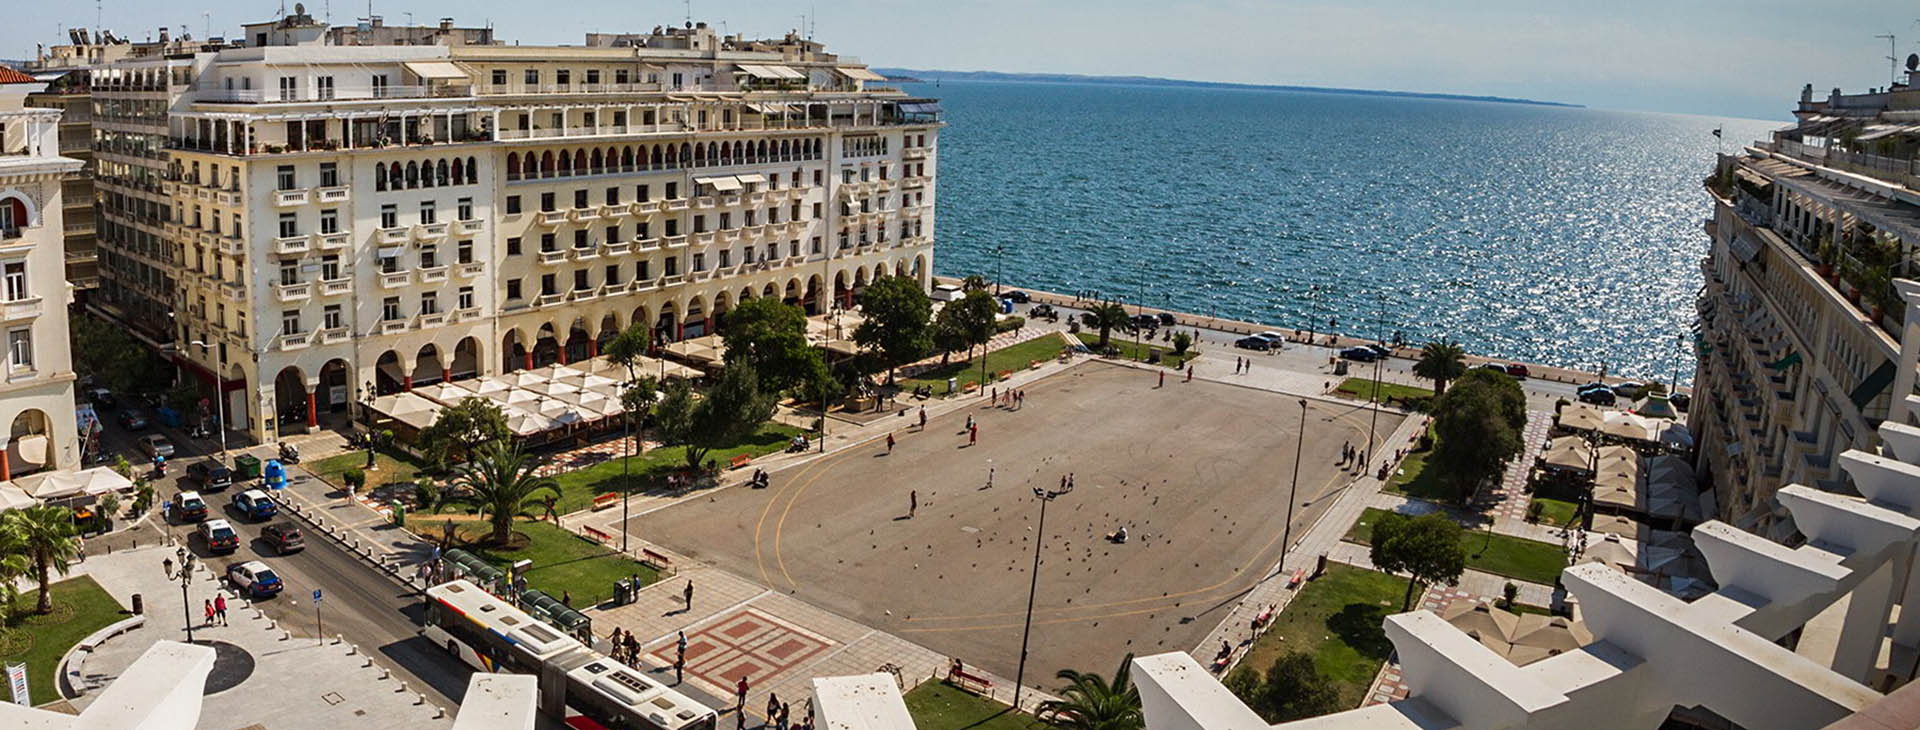 Aristotelous square, Thessaloniki City